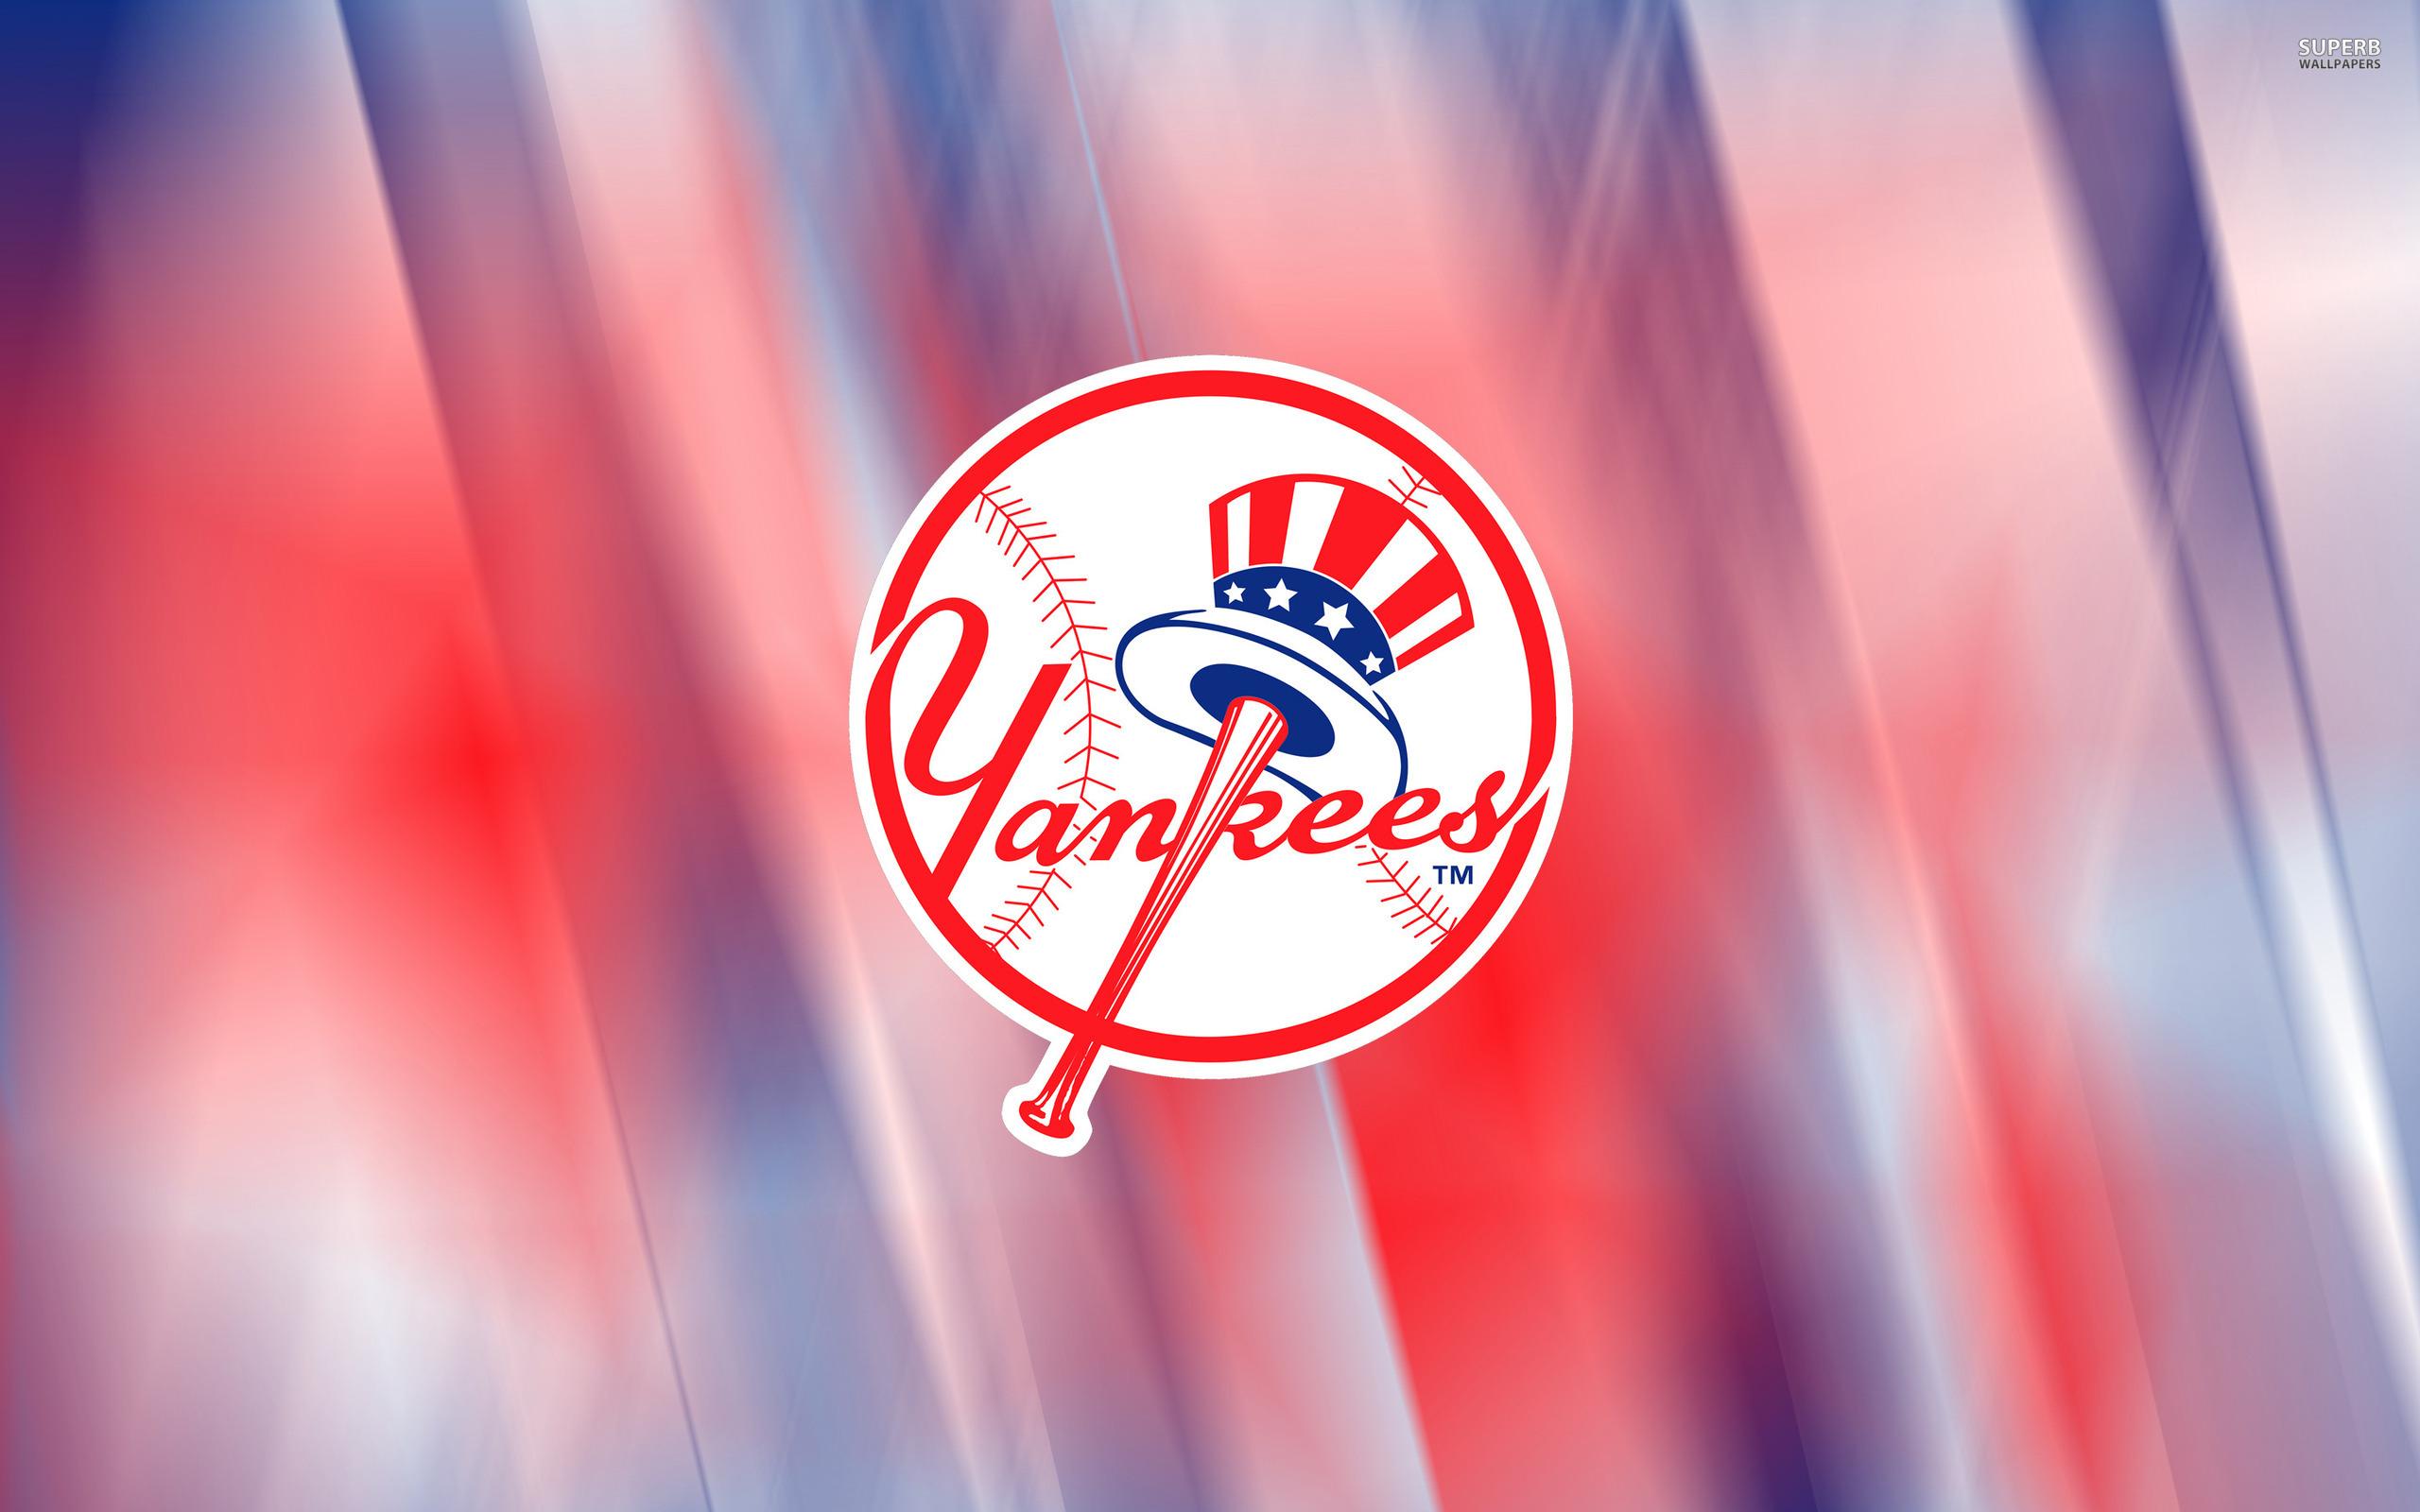 2560x1600px ny yankees wallpaper border wallpapersafari new york yankees baseball mlb vn wallpaper 2560x1600 158283 2560x1600 voltagebd Choice Image